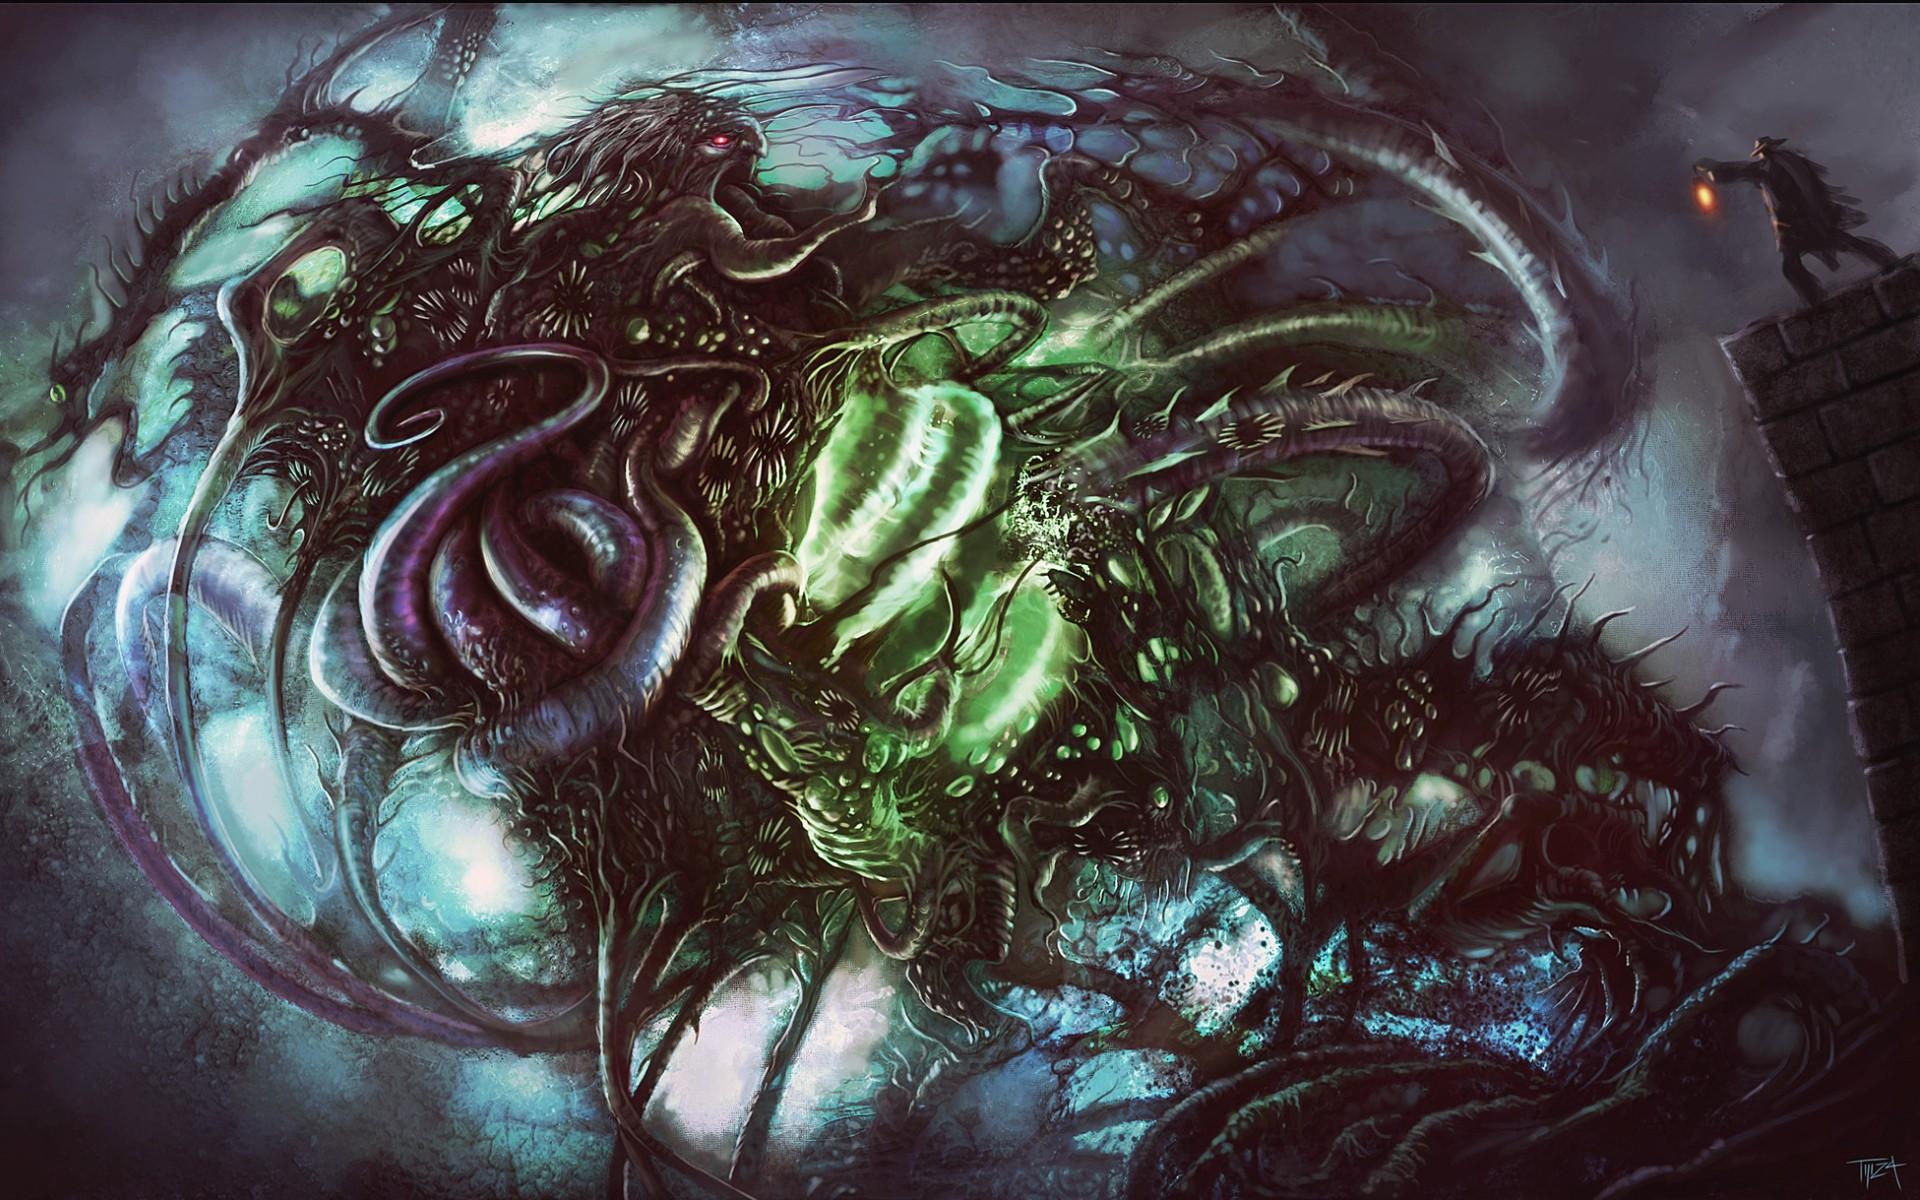 Wallpaper : drawing, painting, digital art, horror, space